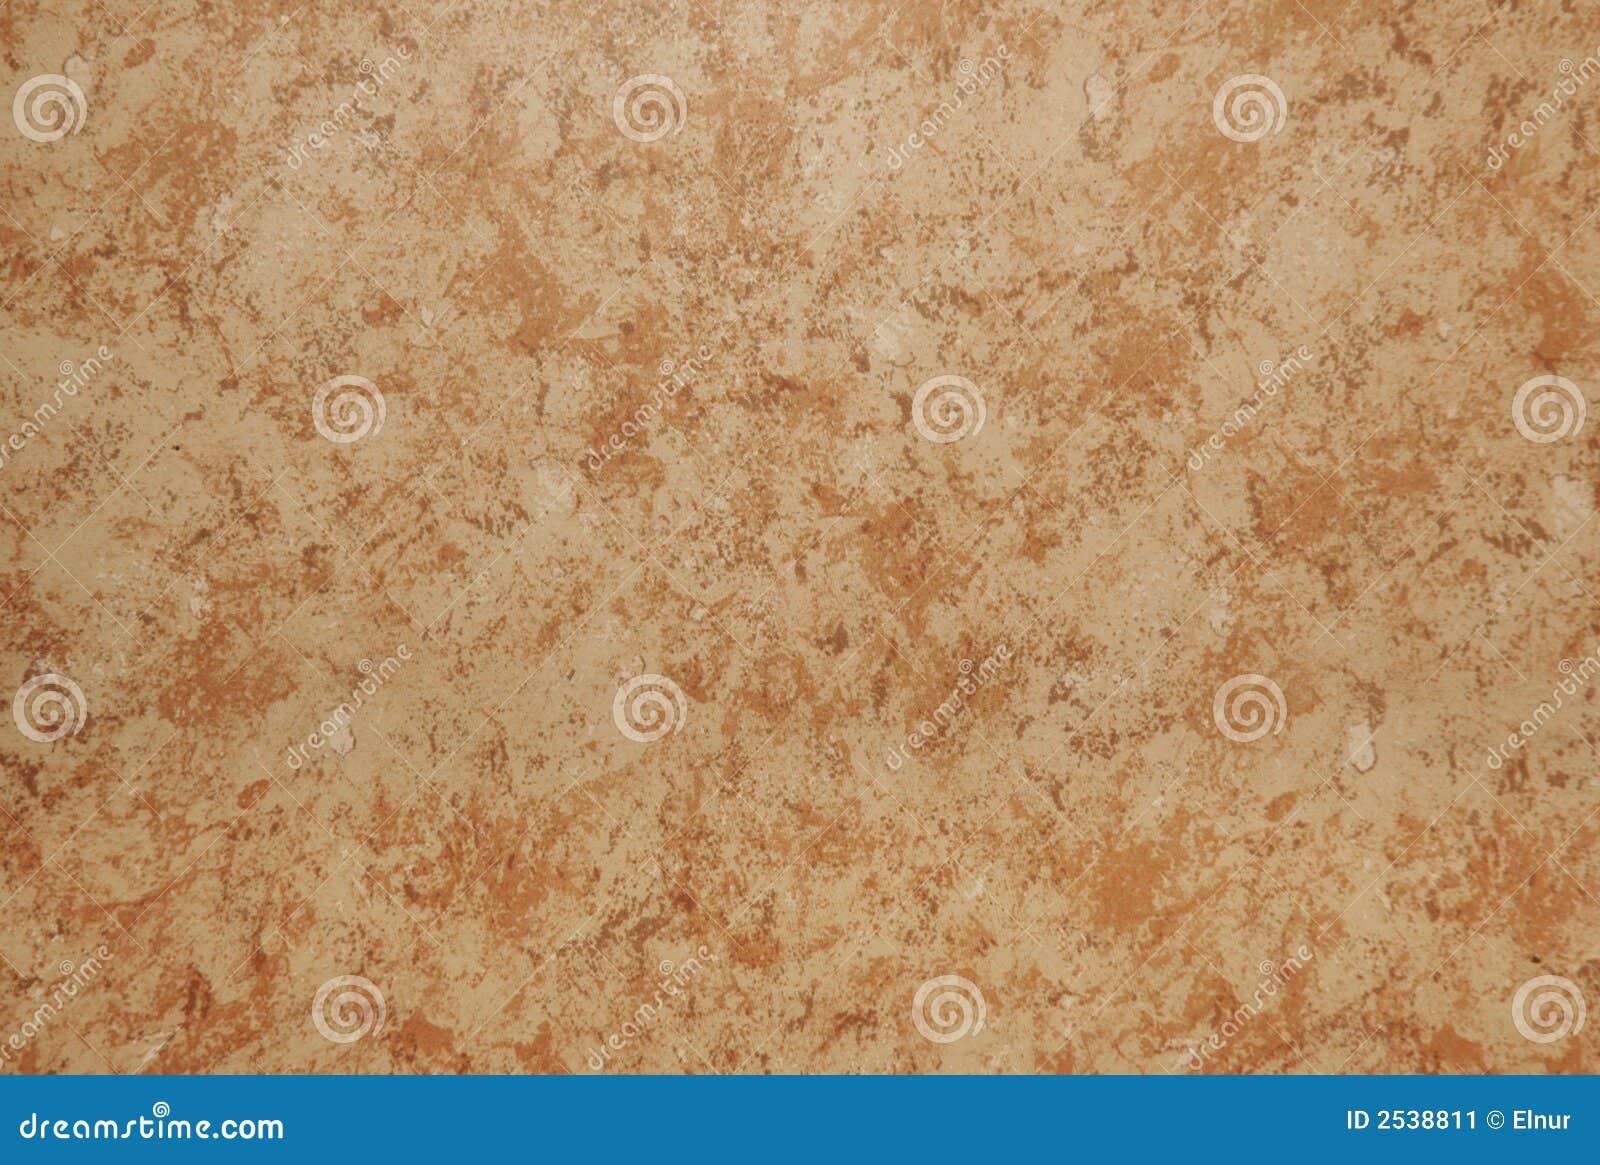 textura de m rmol imagen de archivo imagen 2538811